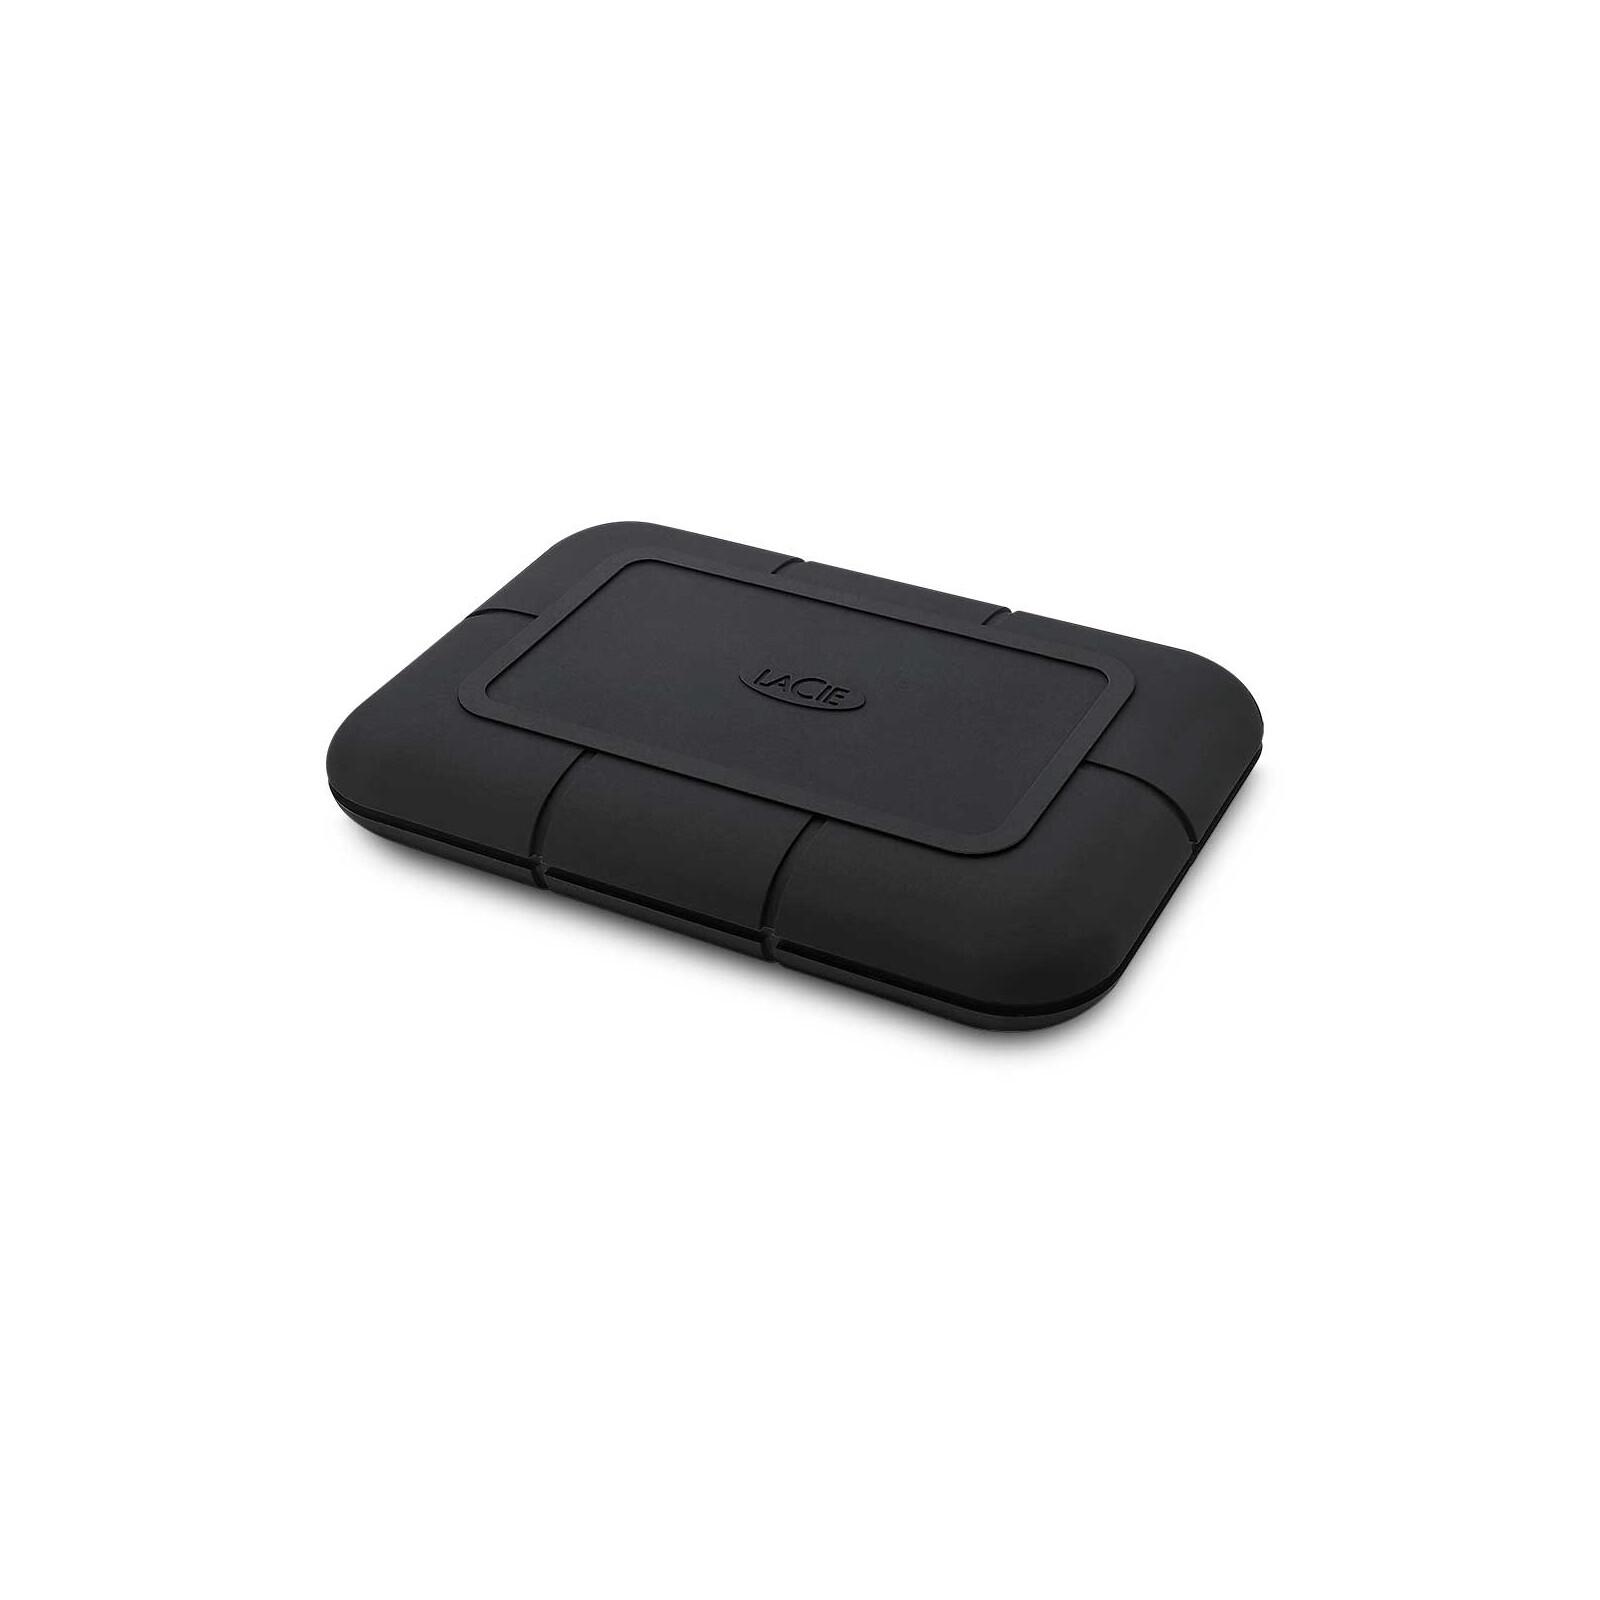 LaCie Rugged PRO SSD 2TB USB 3.1 Typ-C, Rescue